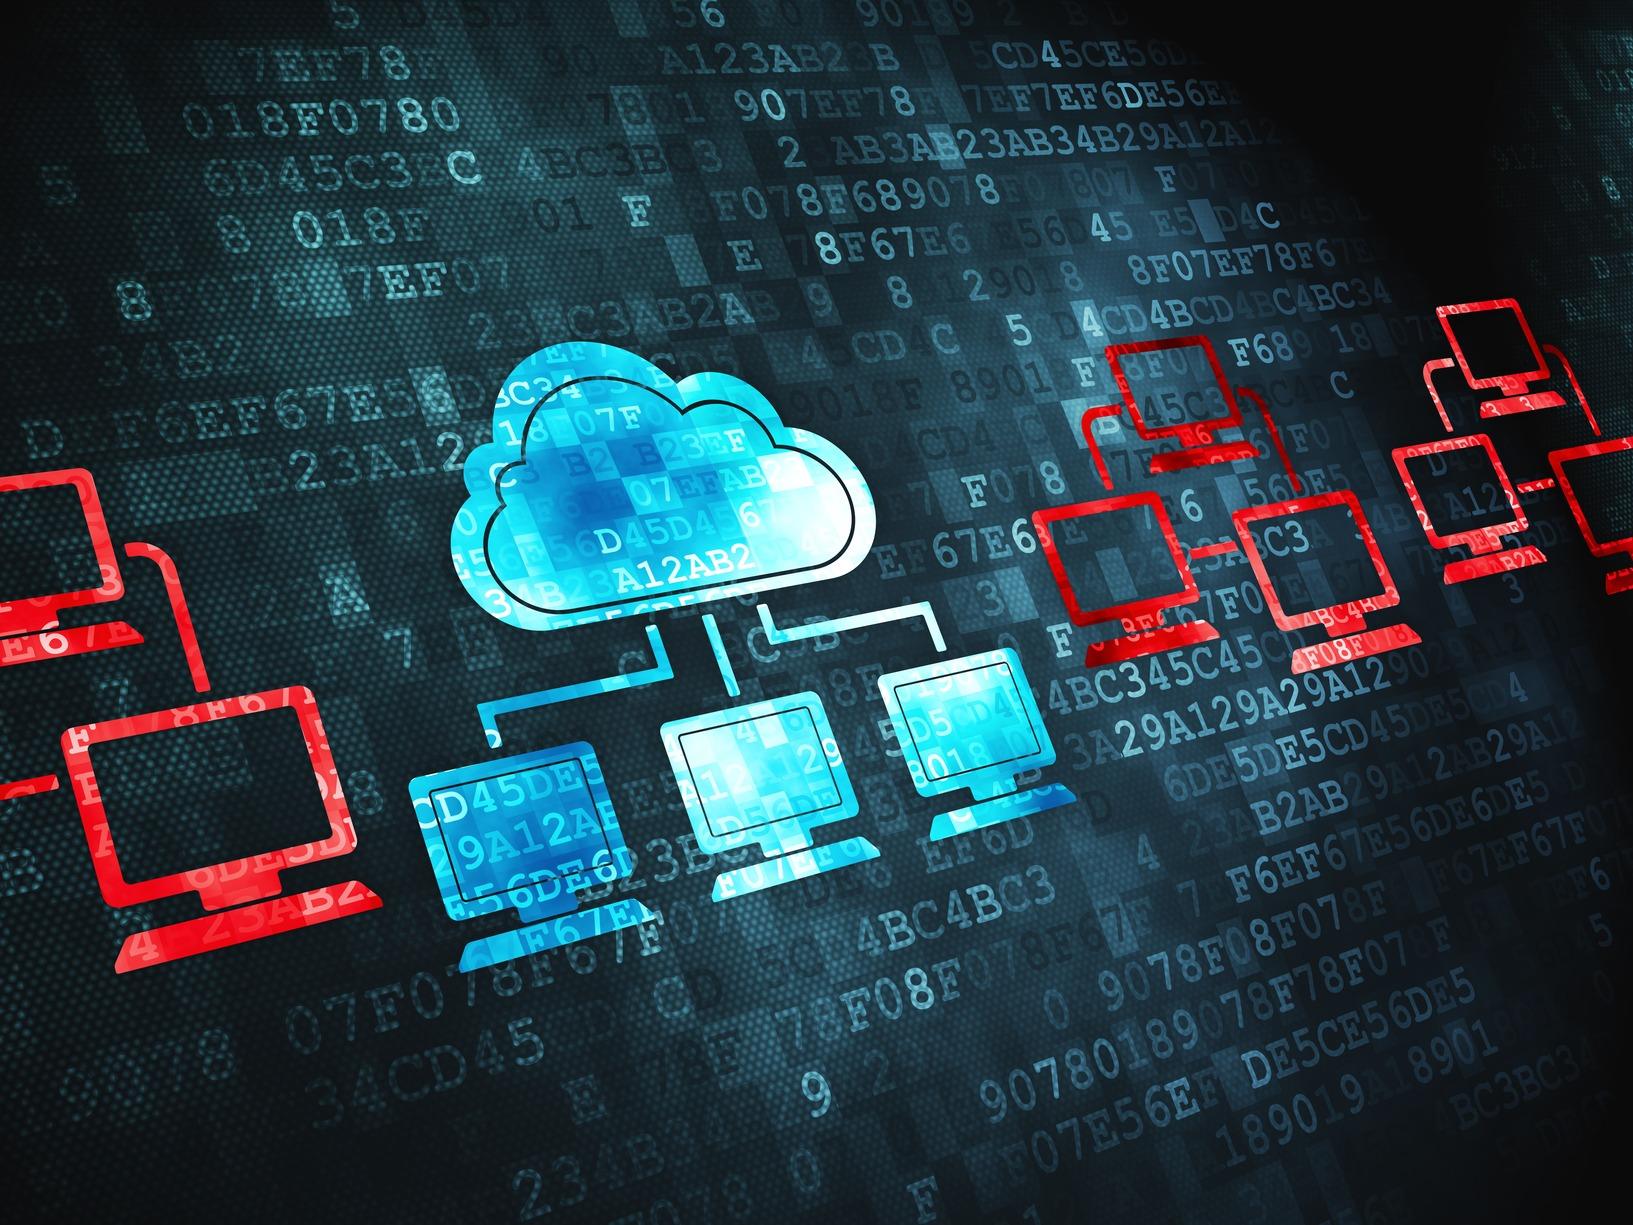 3d Cisco Hd 1920x1080 Wallpaper Network Security Pcl Solutions